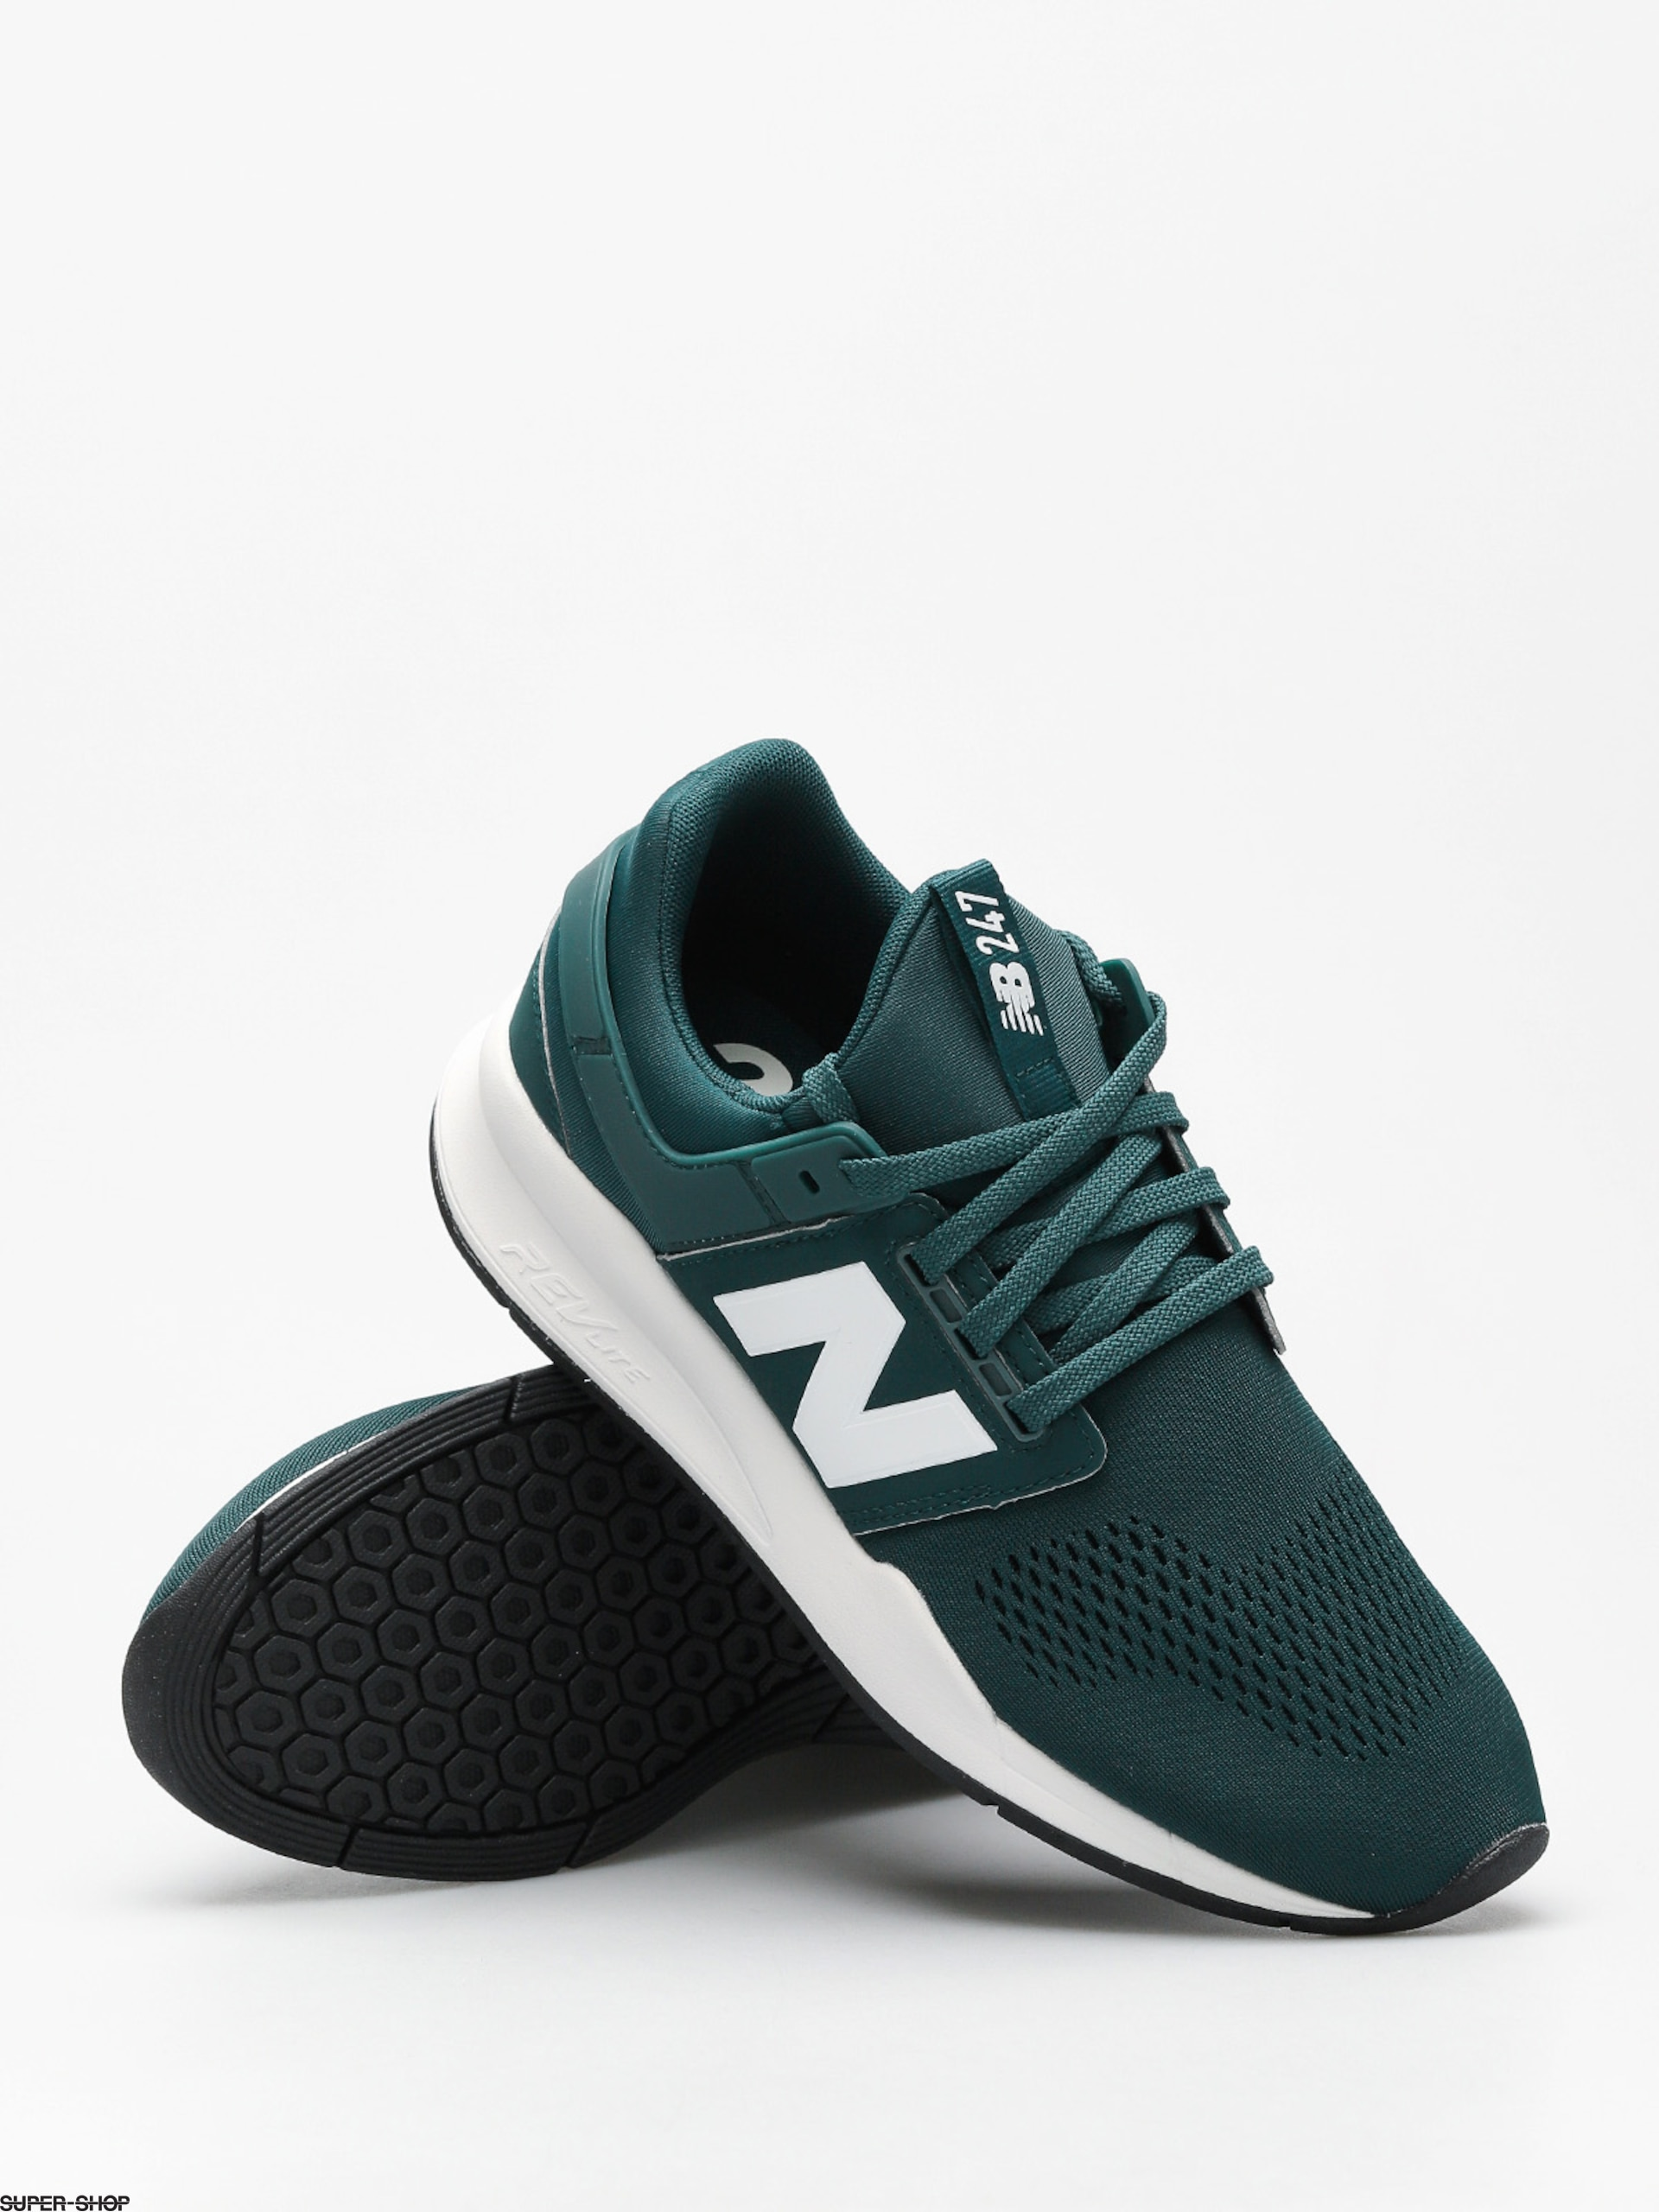 cheap for discount e1d0c 02f4b New Balance Shoes 247 (deep jade)